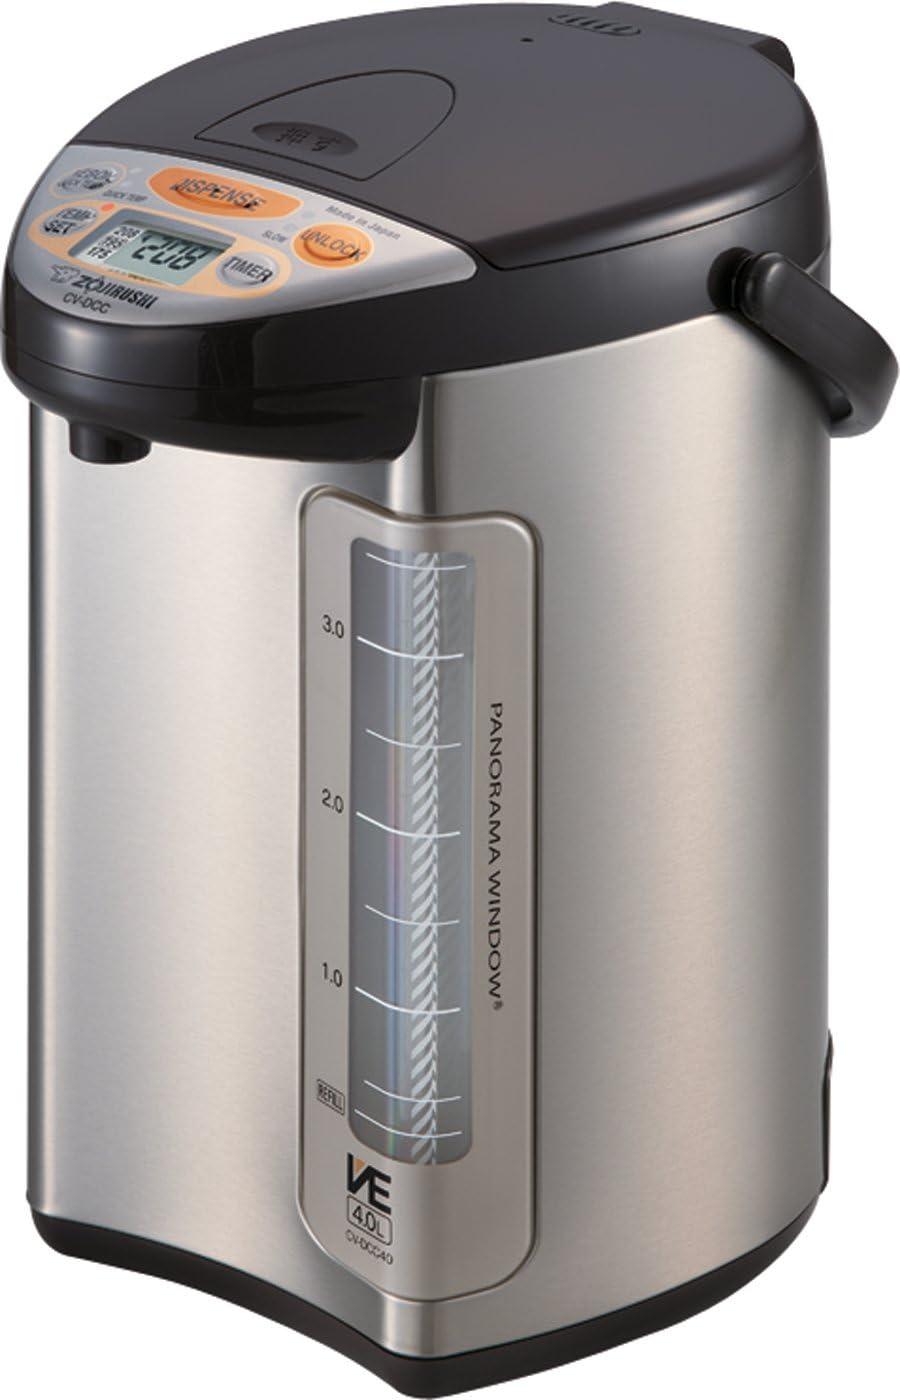 Zojirushi America Popular Corporation Genuine Free Shipping Hybrid Water Boiler Warmer And 4-